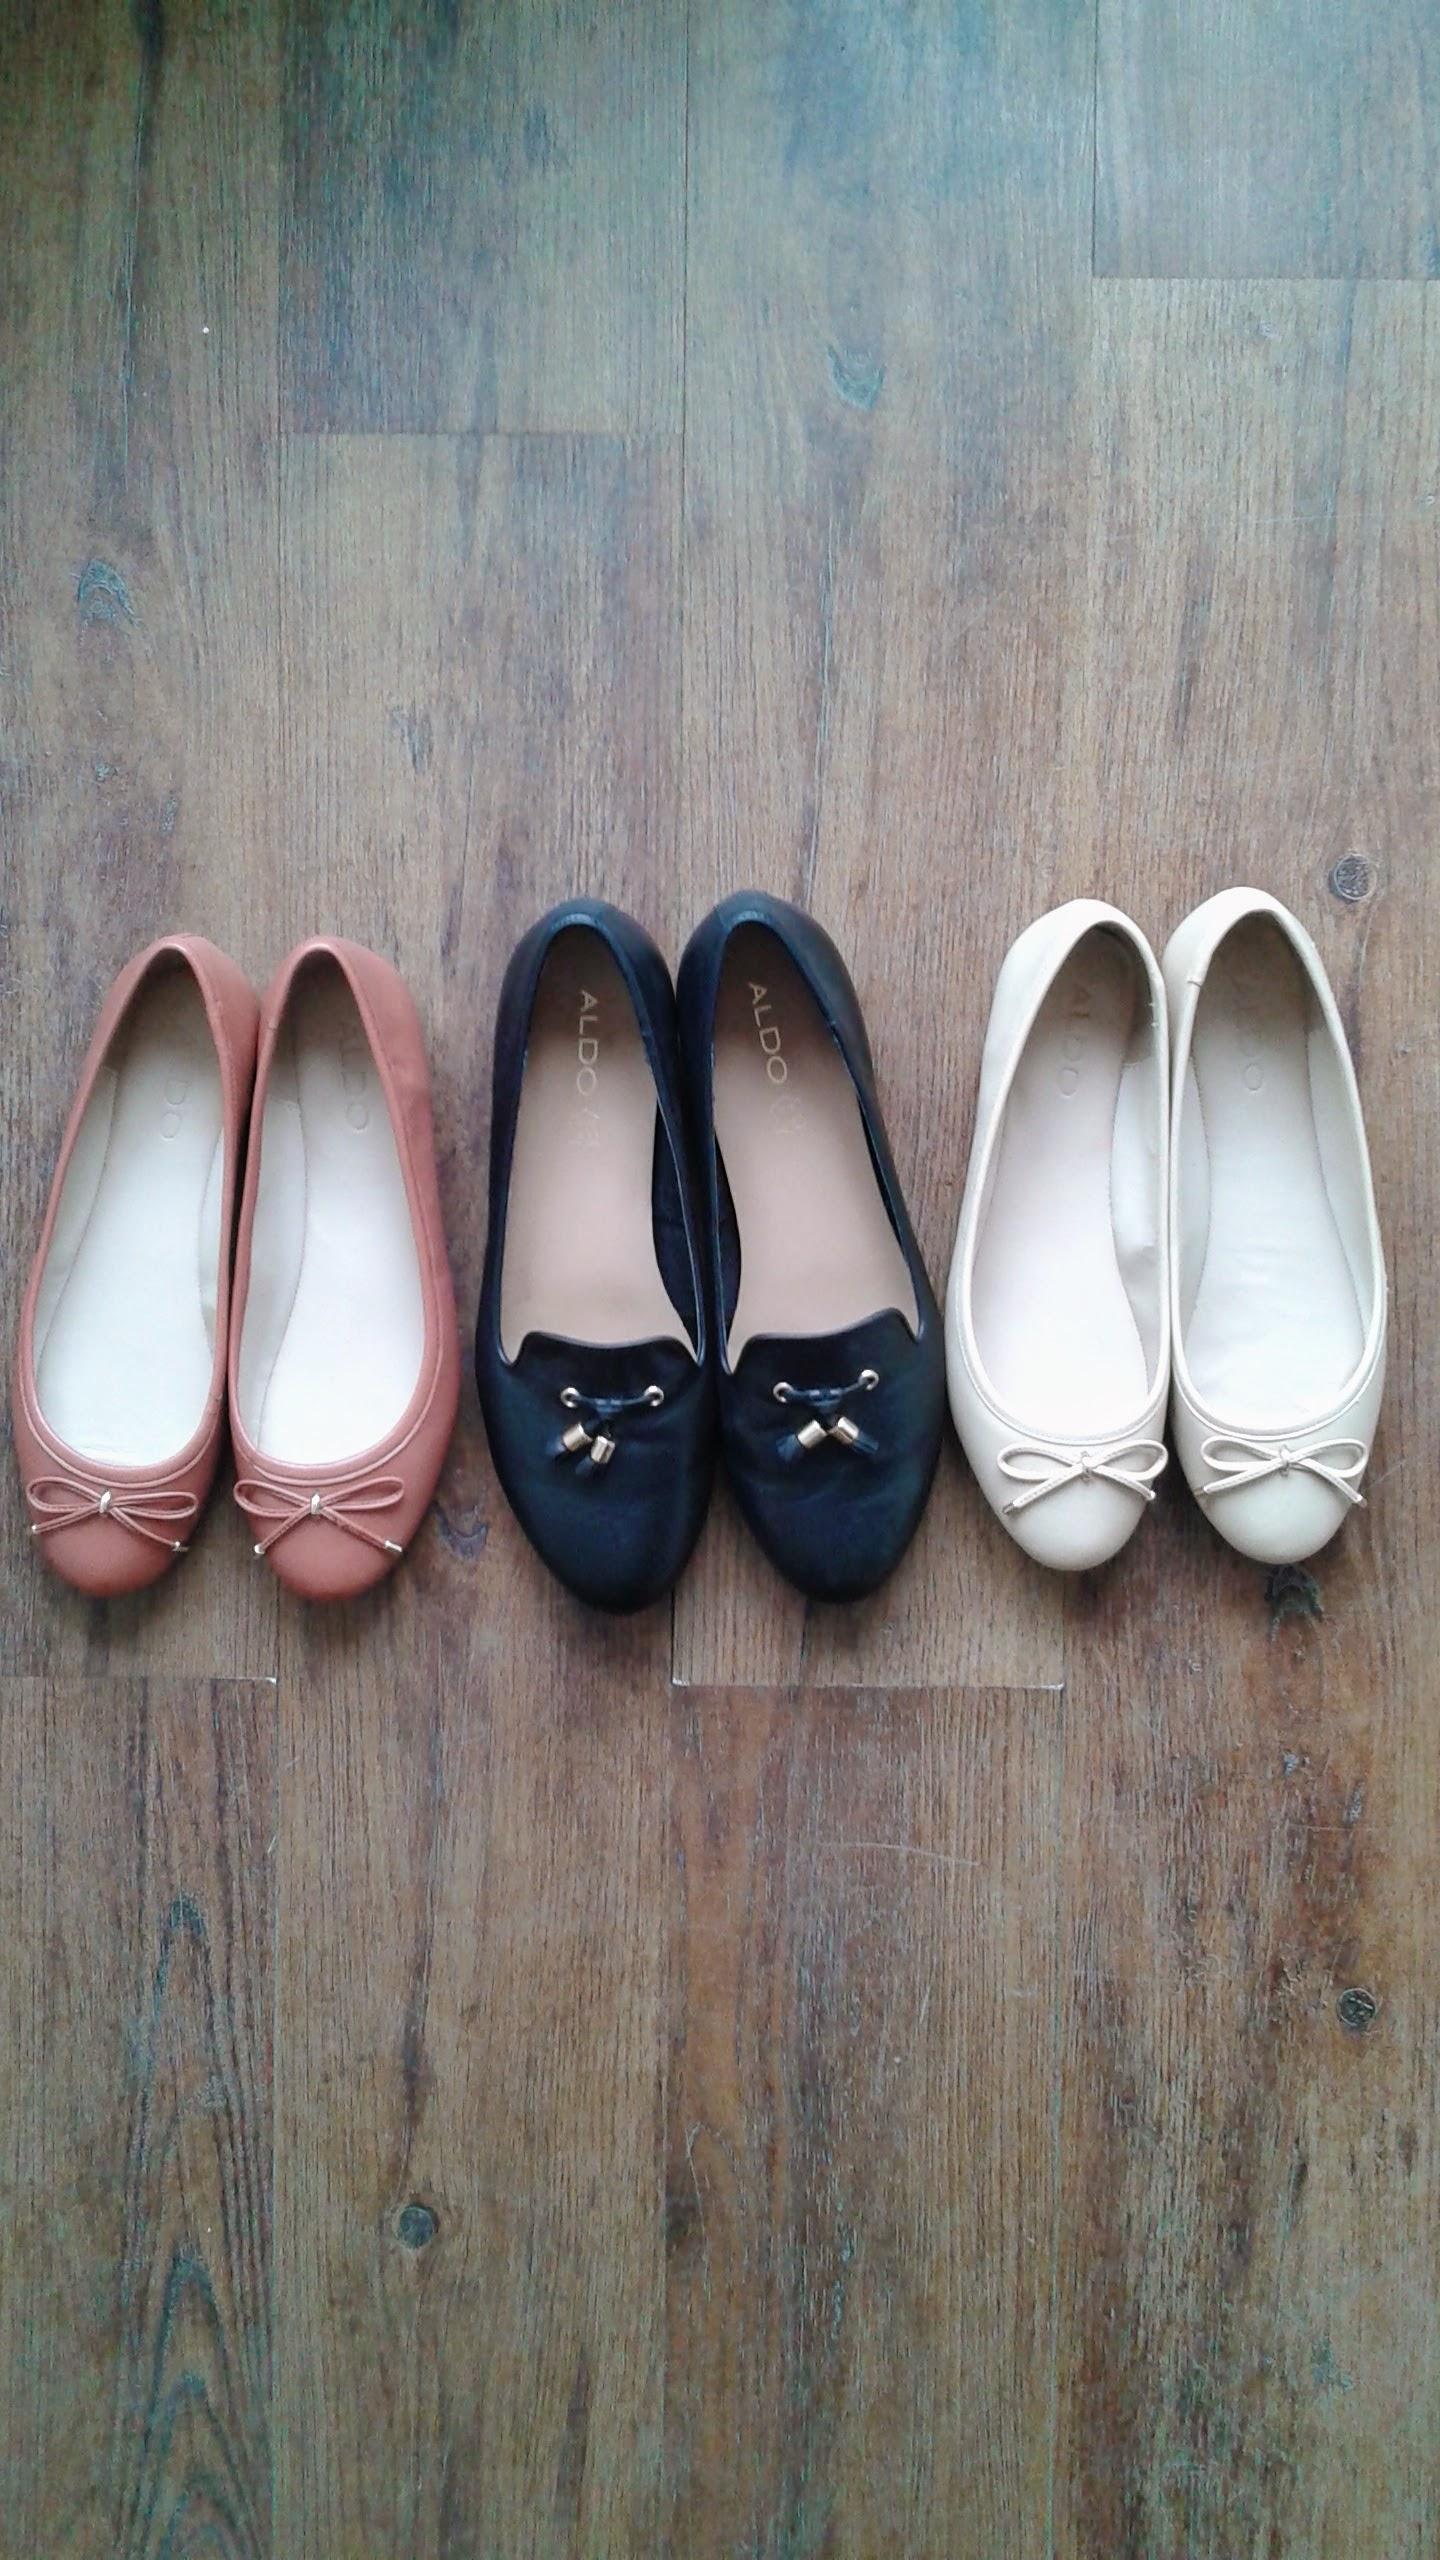 Aldo shoes: Salmon, S7, $28; Black, S8.5, $32; Beige S7, $28